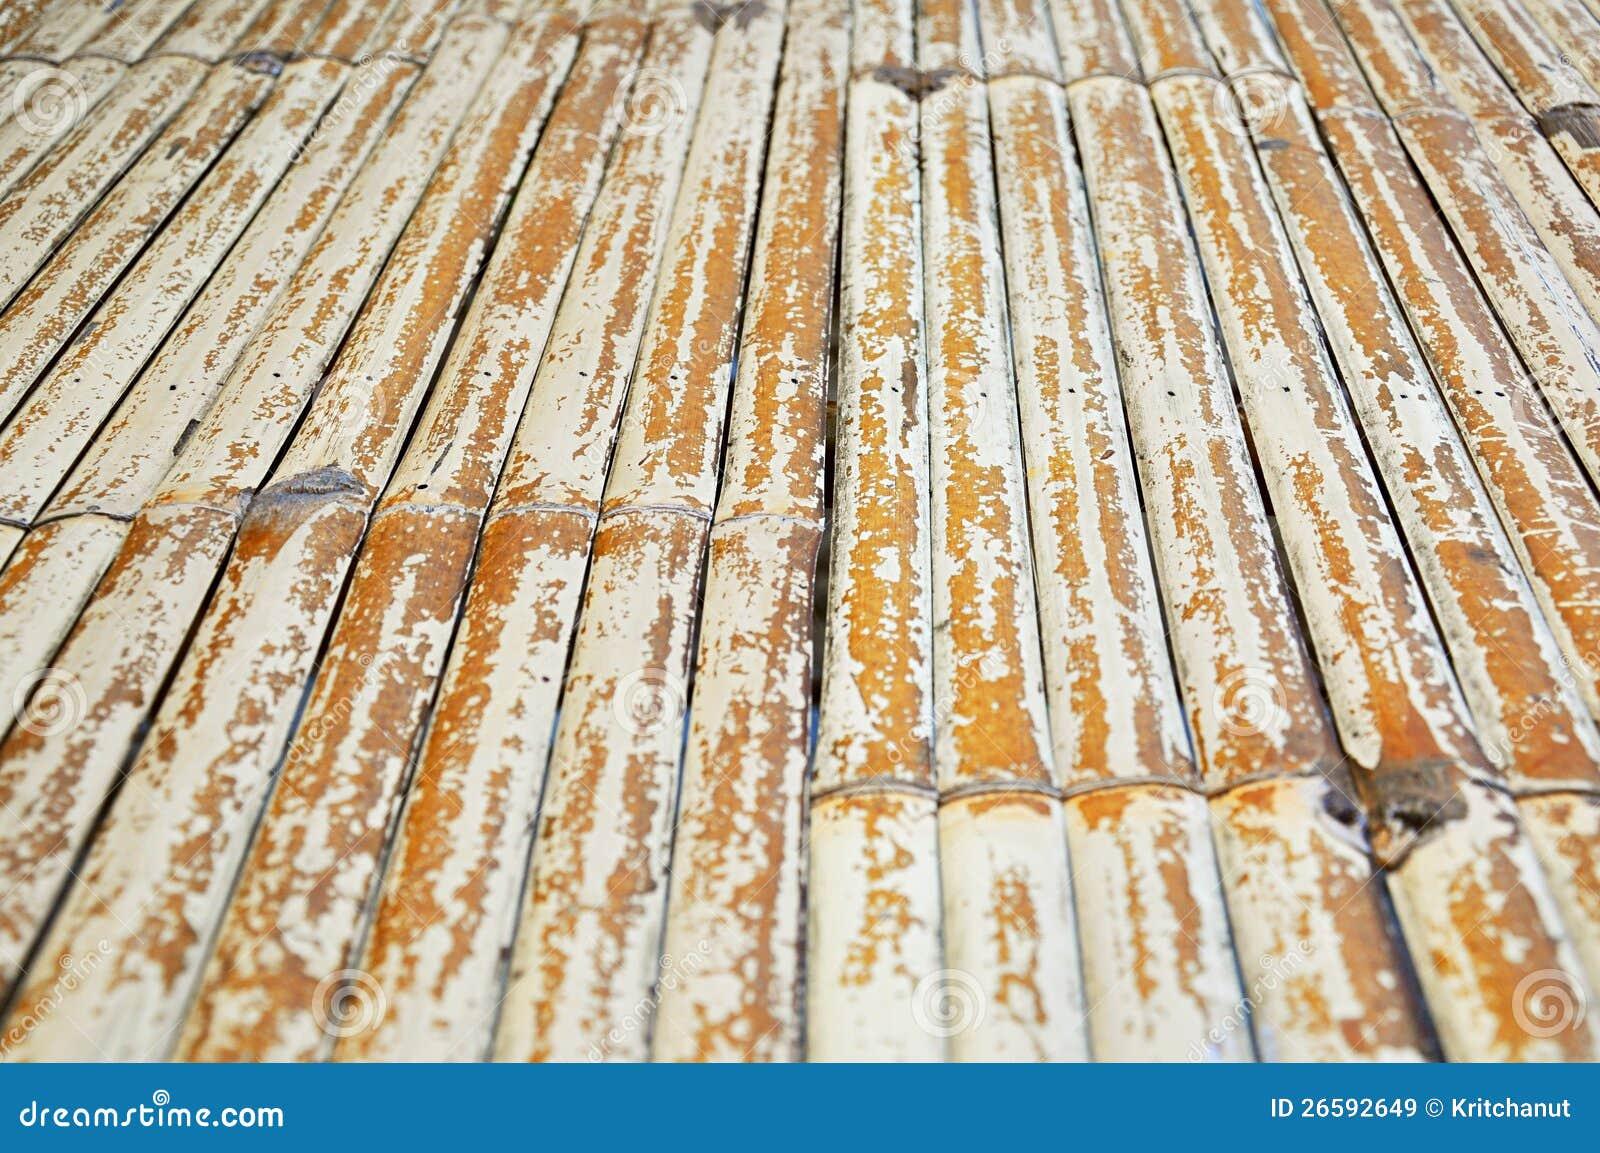 Bambu Seco Viejo Imagen De Archivo Imagen De Brillante 26592649 - Bambu-seco